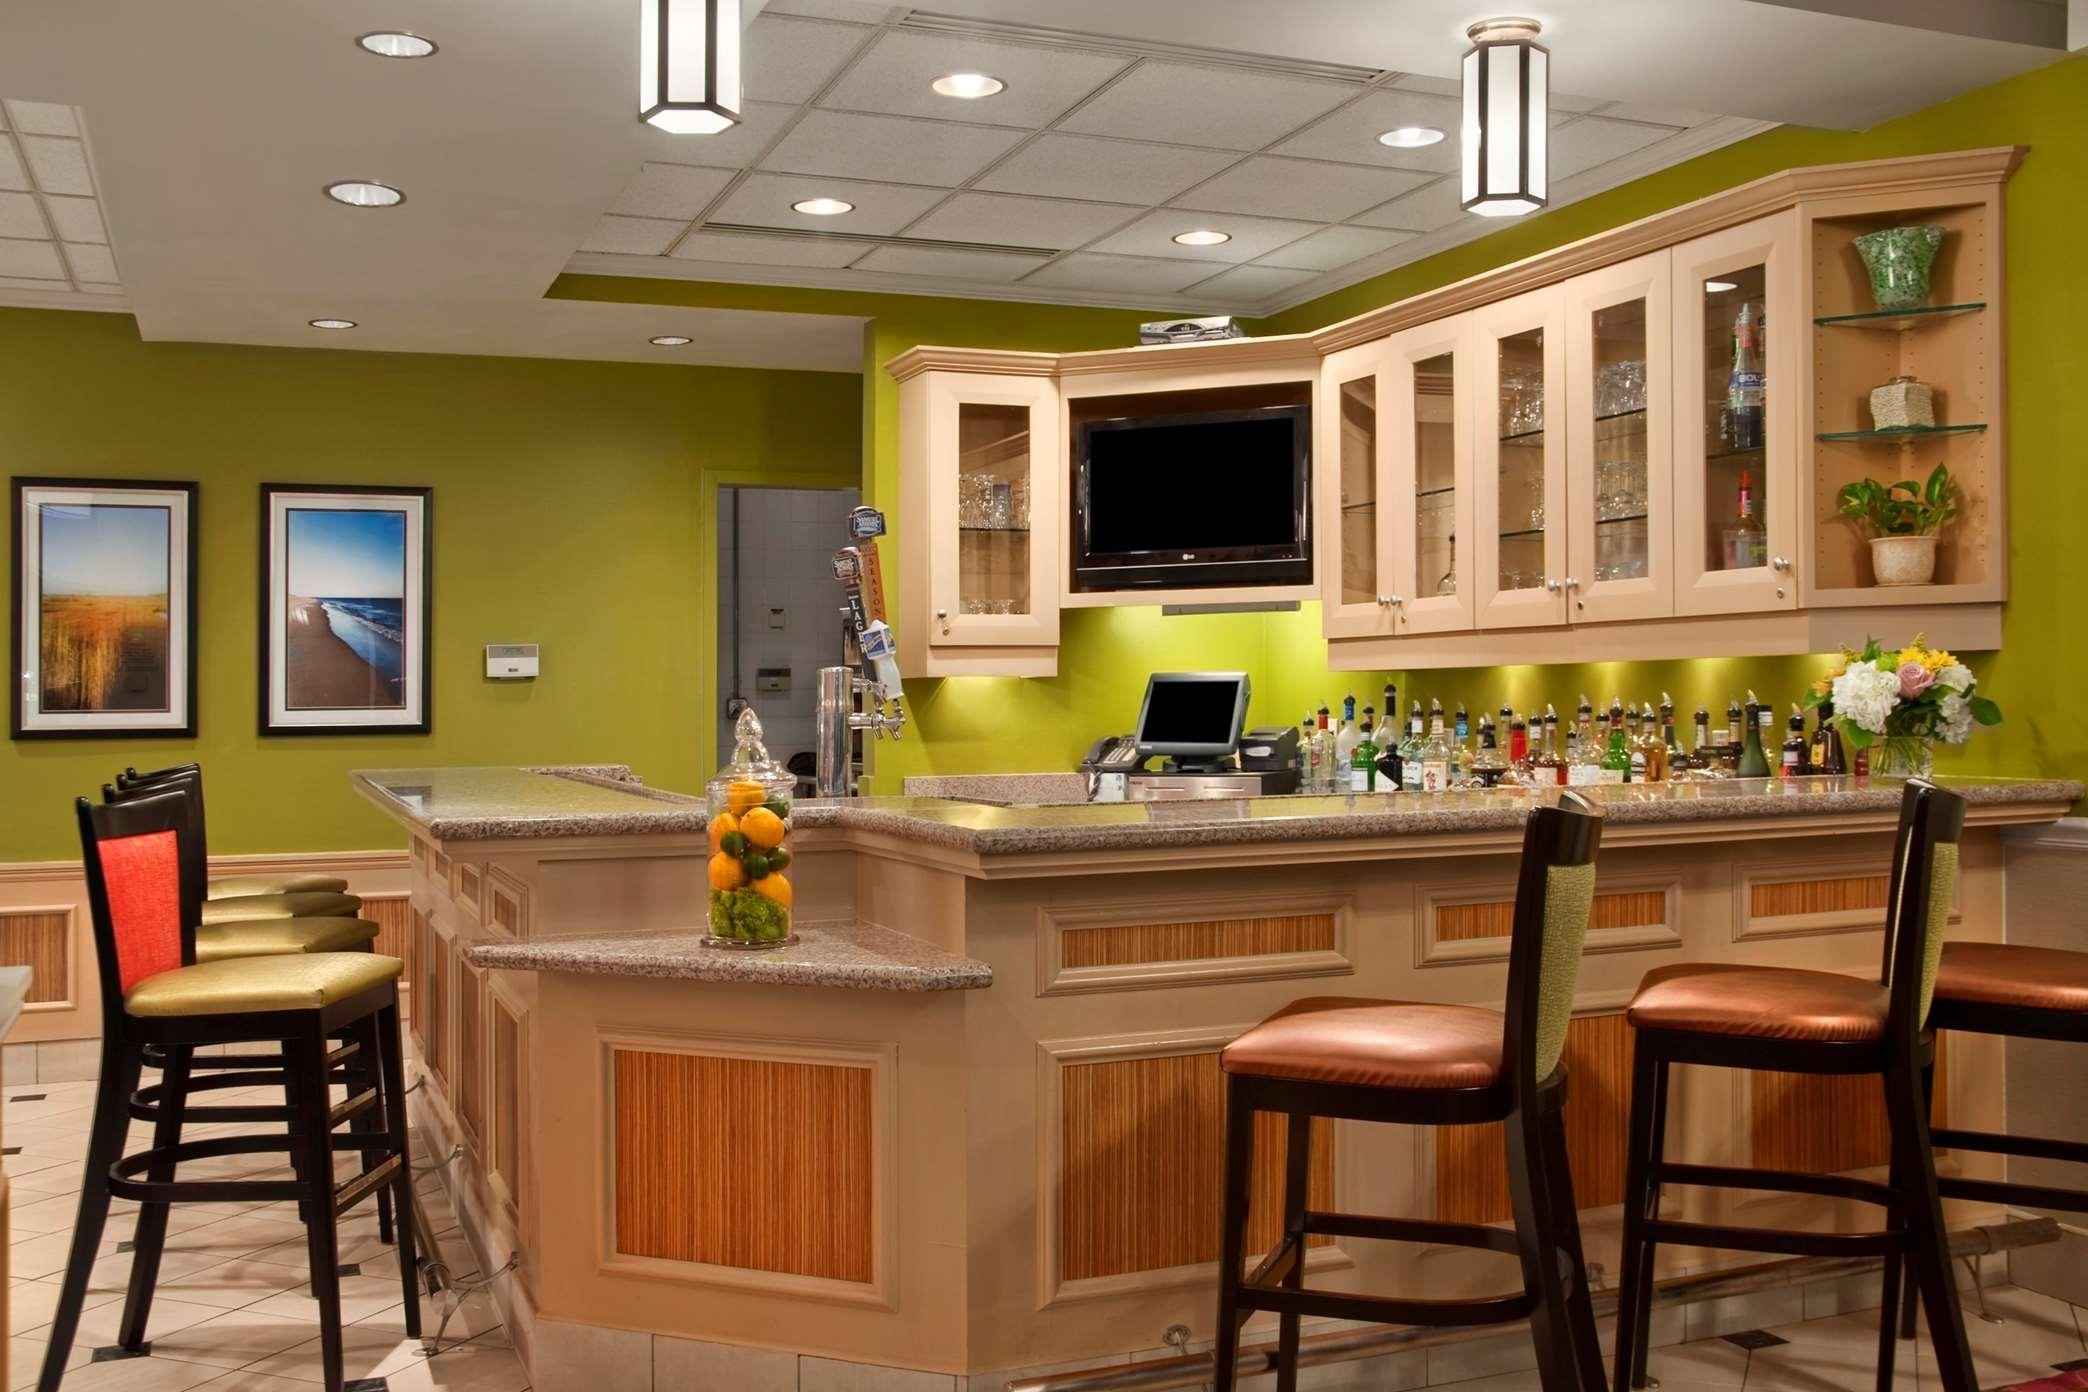 Hilton Garden Inn Islip/MacArthur Airport image 11